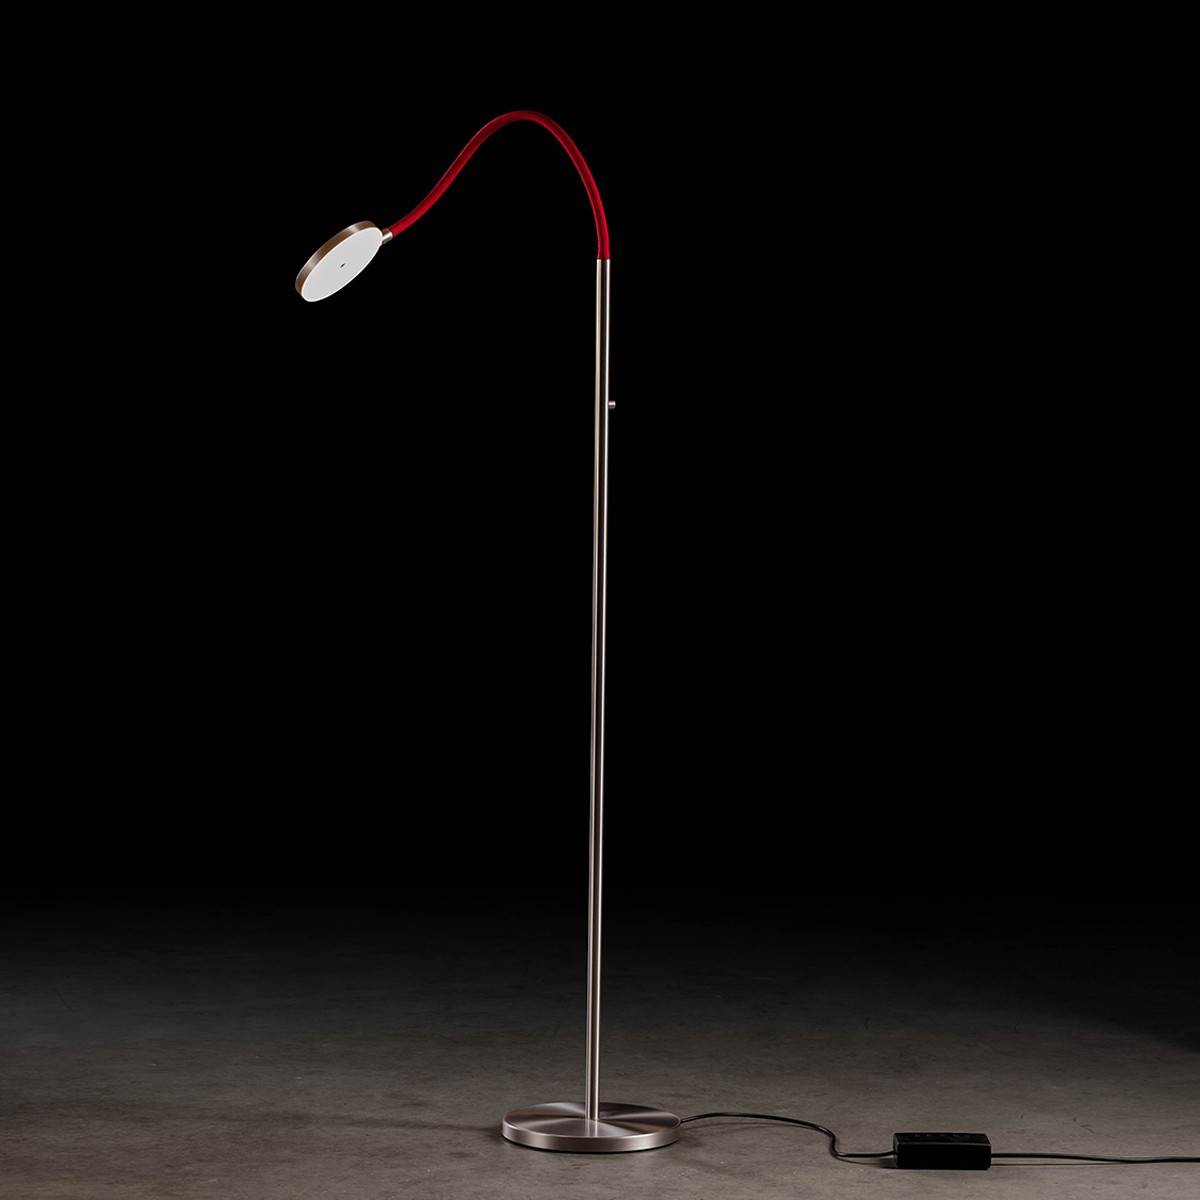 Holtkötter Leuchten Flex S LED Stehleuchte, Aluminium matt / rot